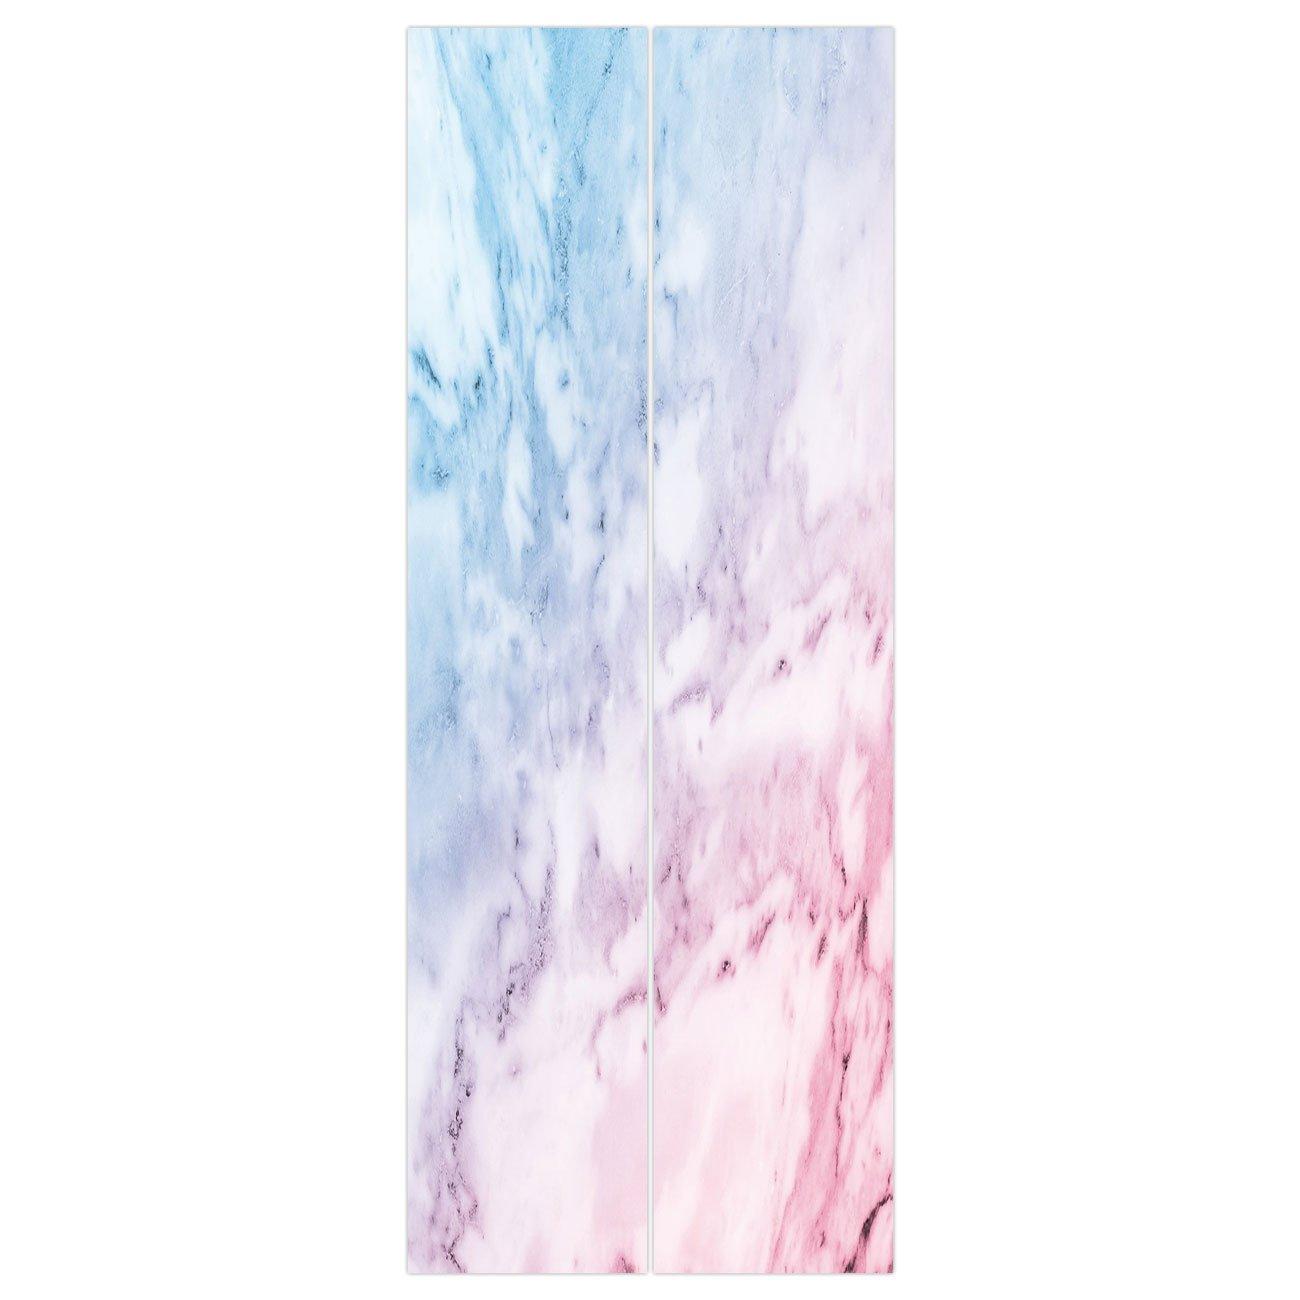 Light Blue Baby Blue 1300x1300 Wallpaper Teahub Io